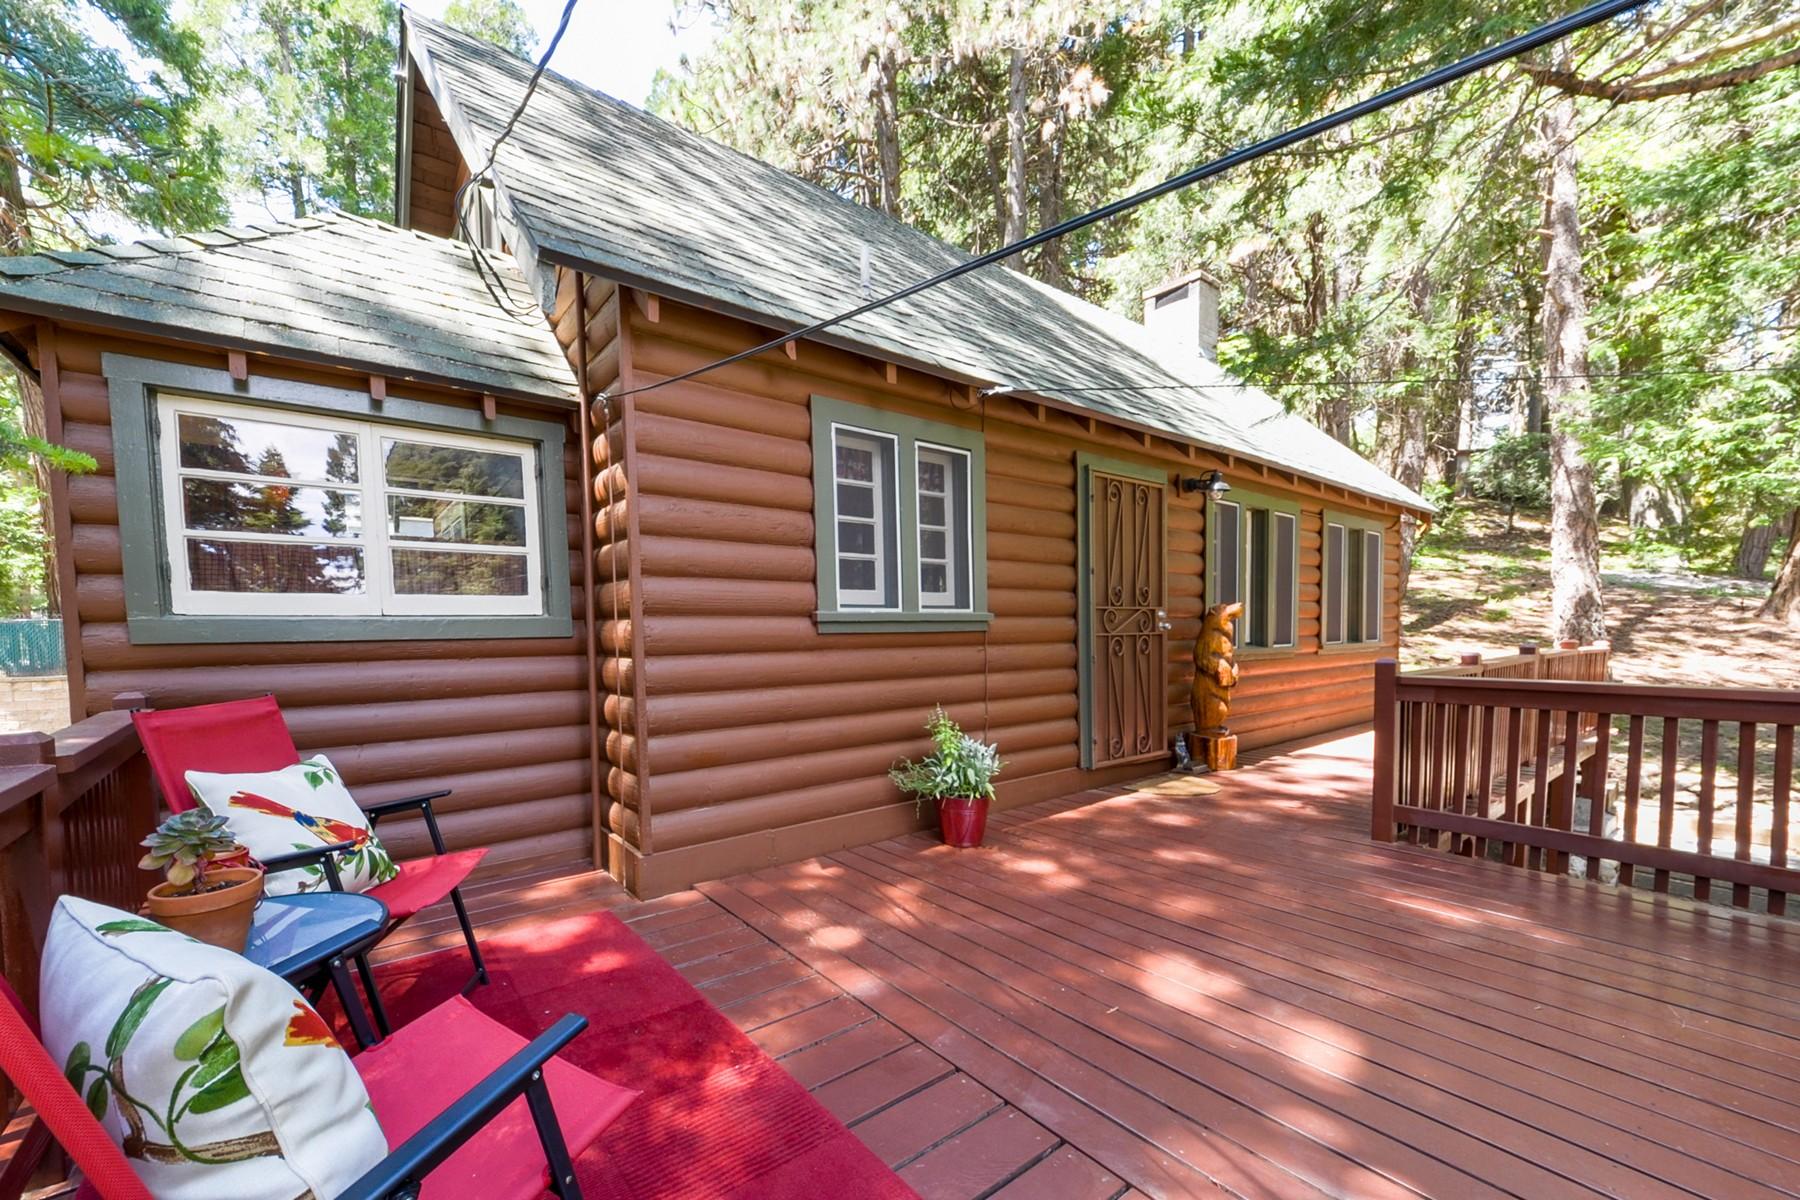 Single Family Homes for Sale at 21777 Jobs Peak Road, Cedarpines Park, California, 92322 21777 Jobs Peak Road Cedarpines Park, California 92322 United States